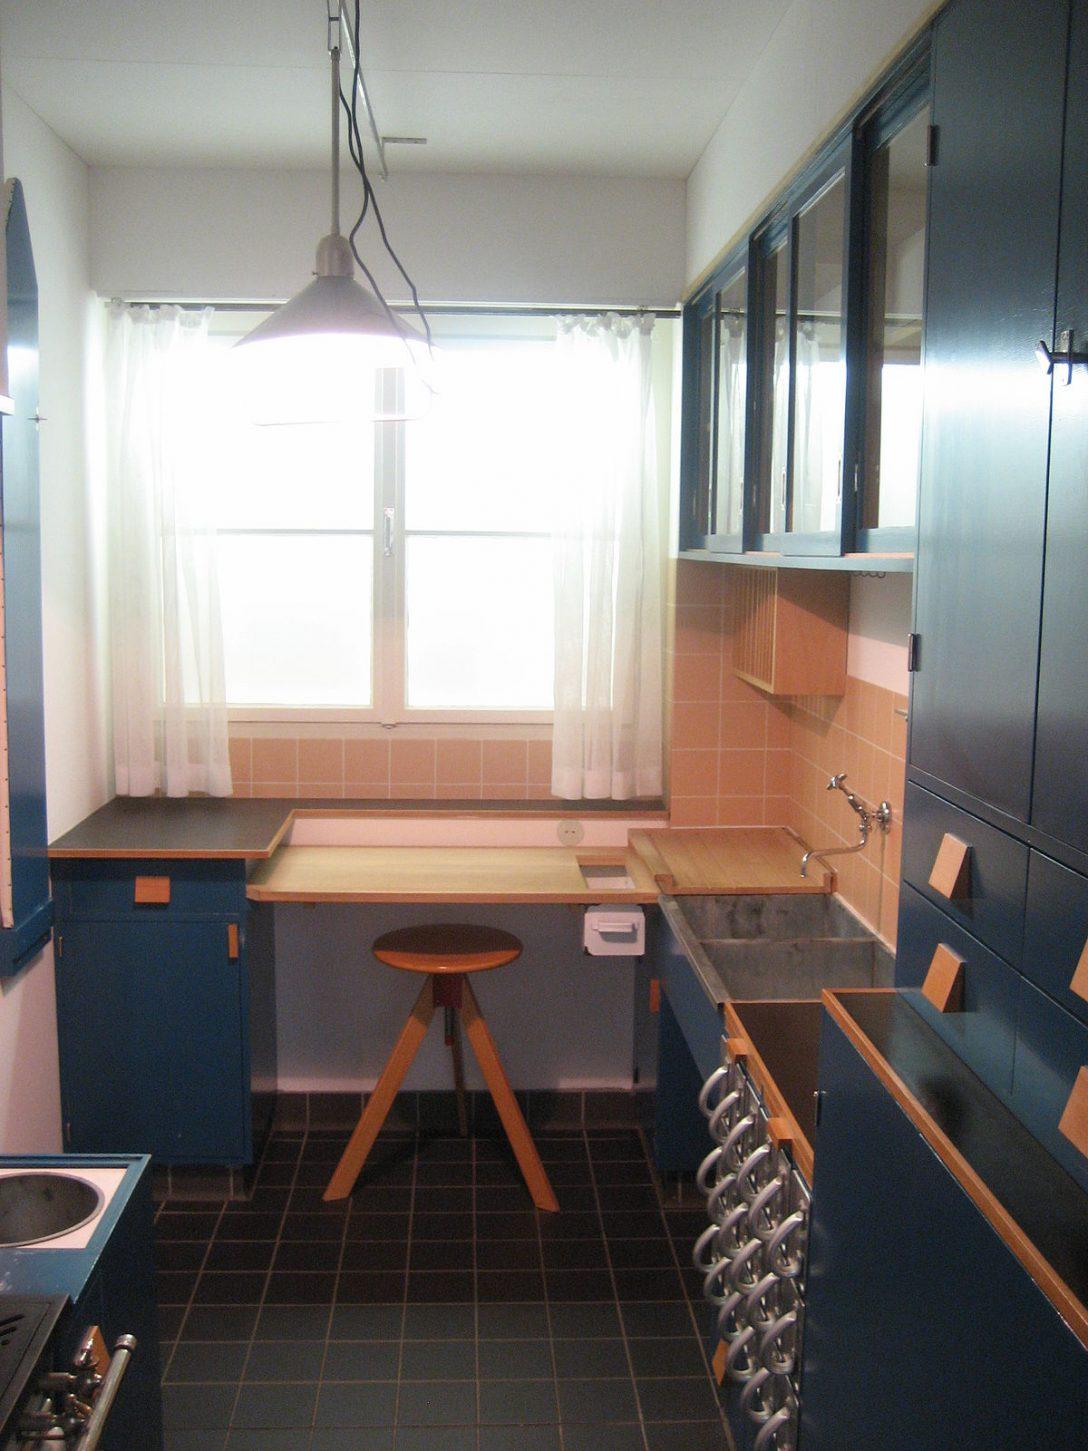 Large Size of Sockelblende Küche Zuschneiden Küche Blende Oben Küche Blende Unten Entfernen Klemme Für Küche Blende Küche Küche Blende